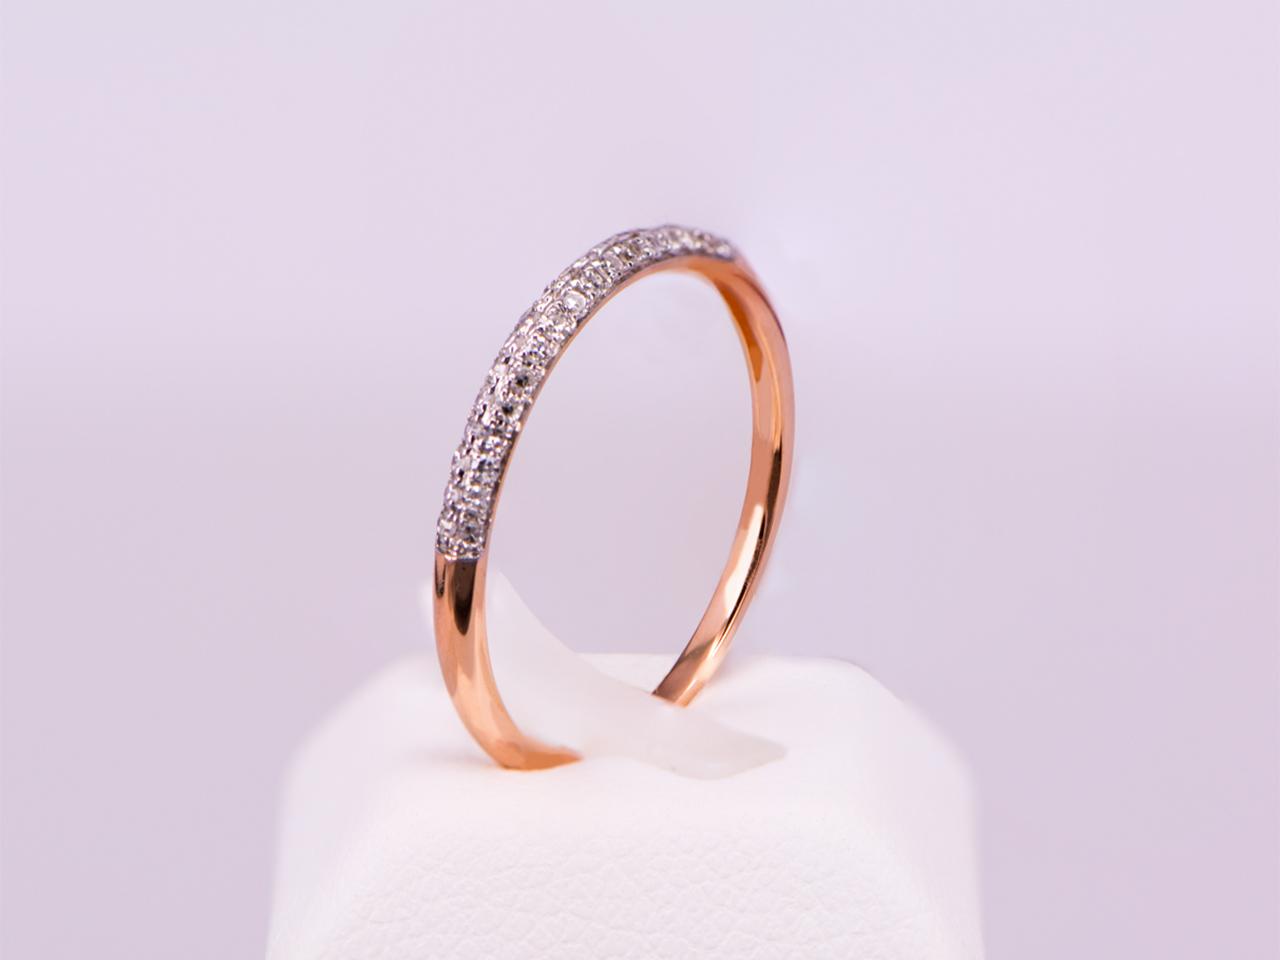 70b6dd83de Δαχτυλίδι σειρέ ροζ χρυσό Κ18 με διαμάντια